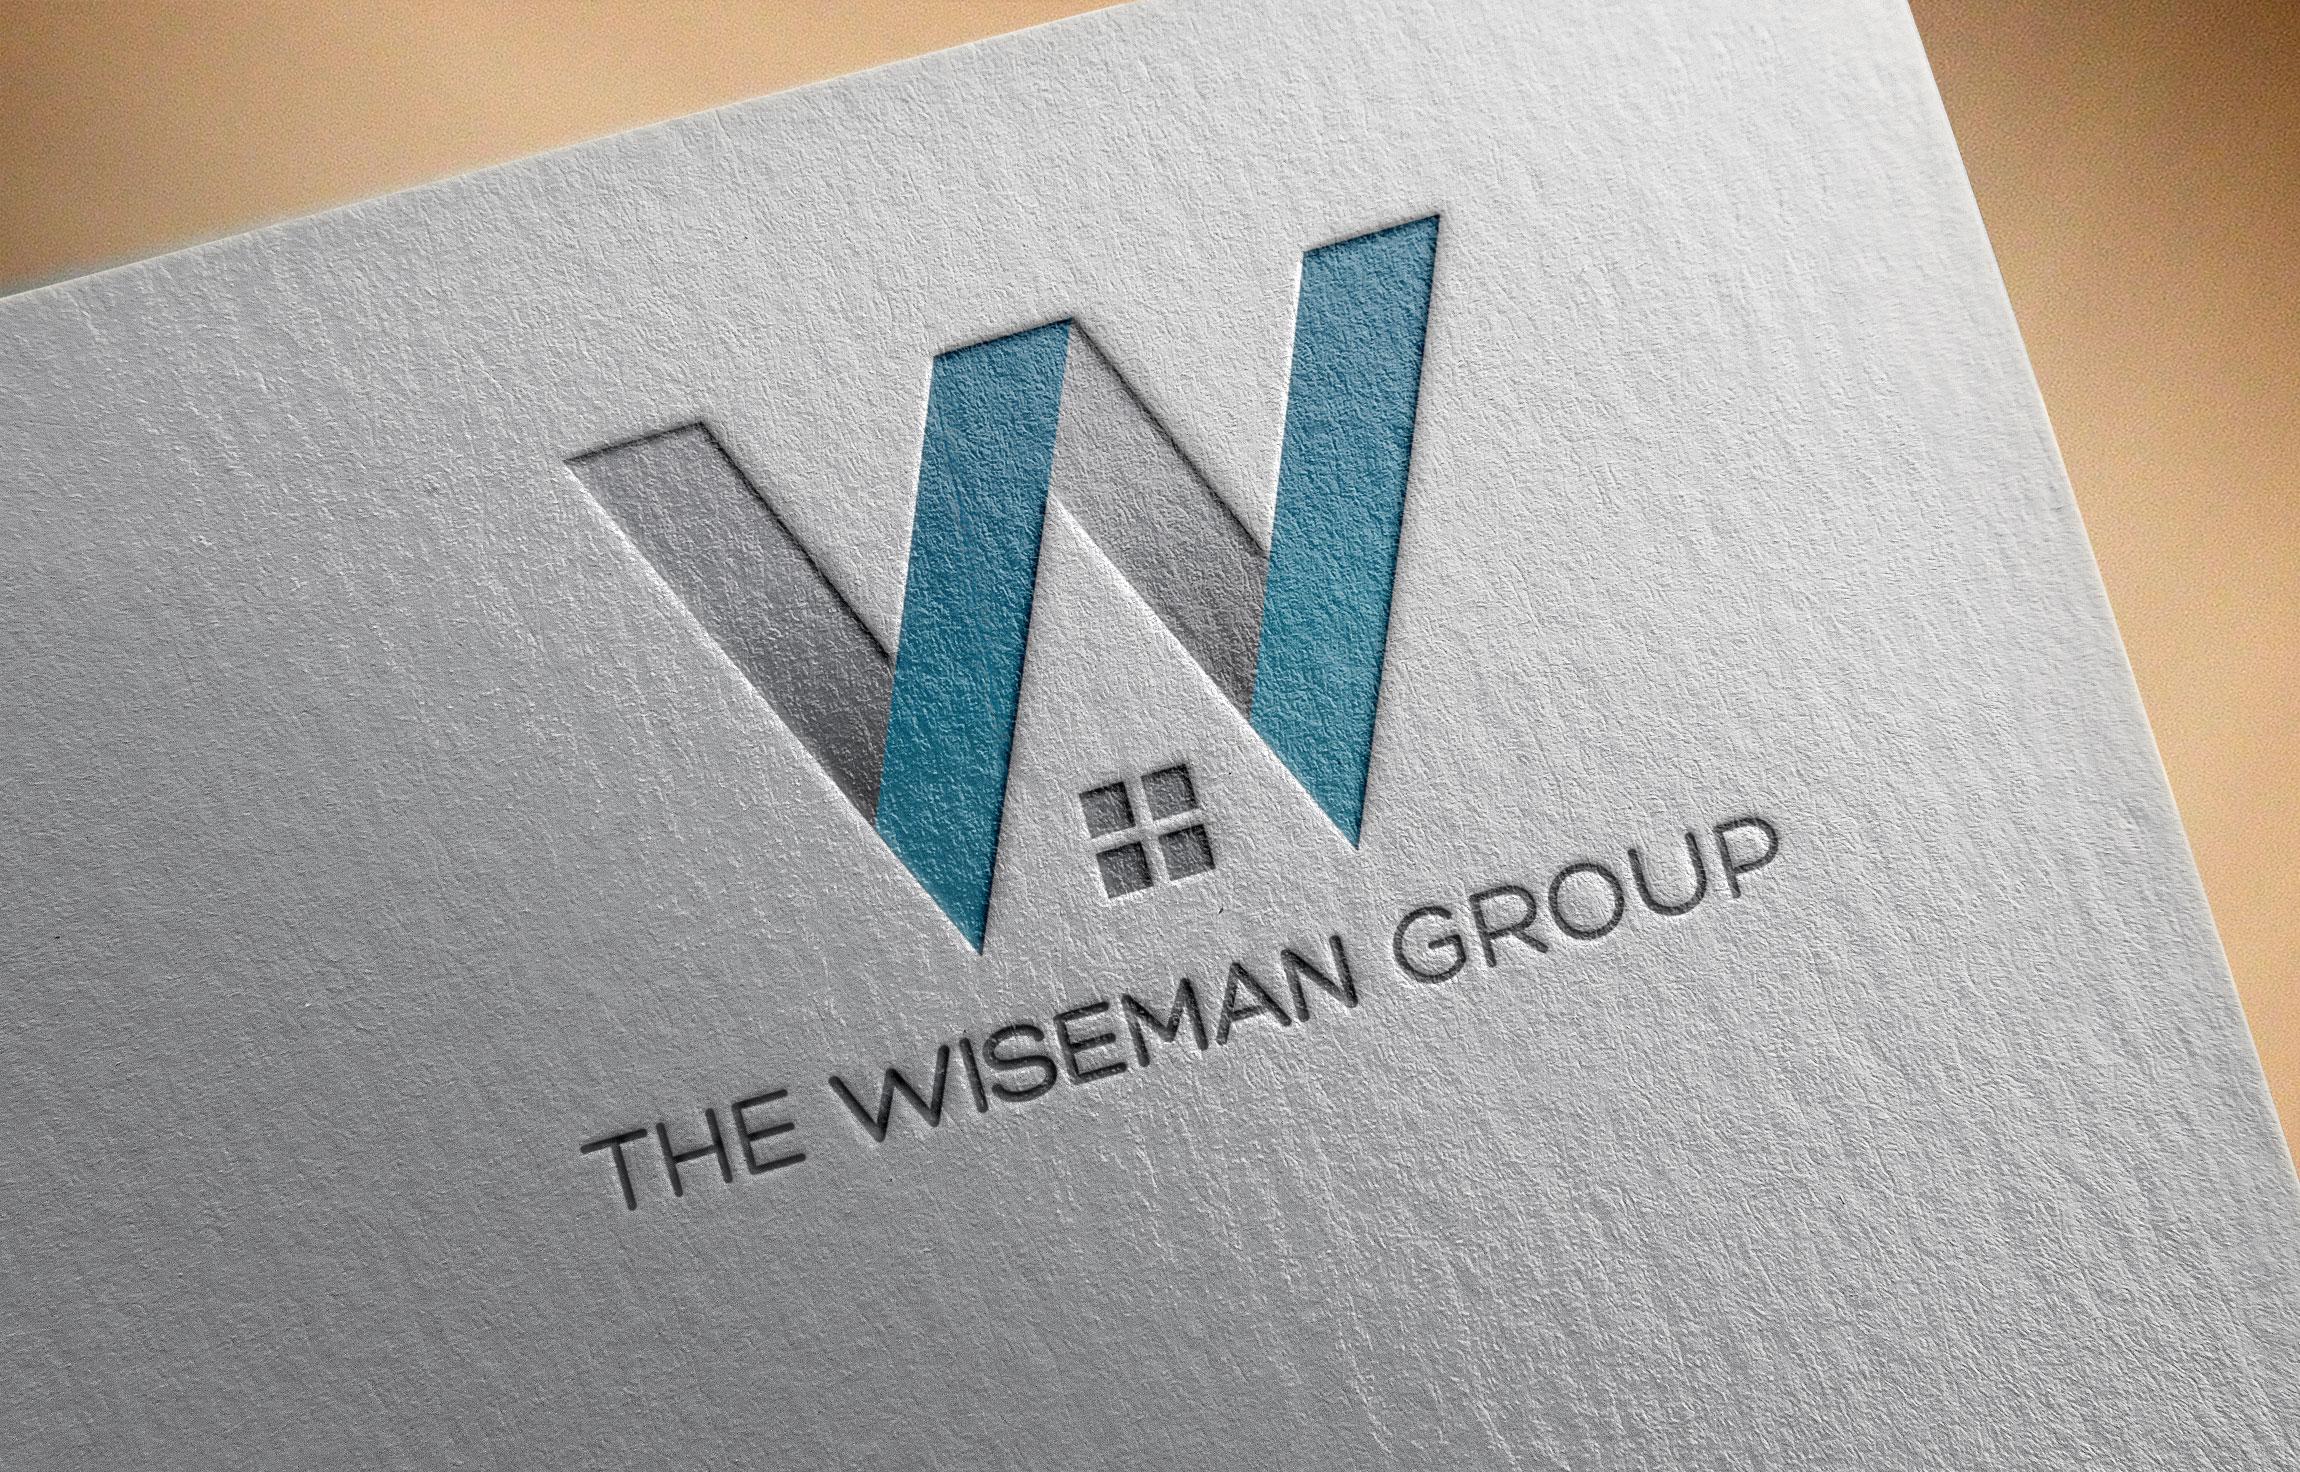 LOGO_Wiseman-Group-Mockup